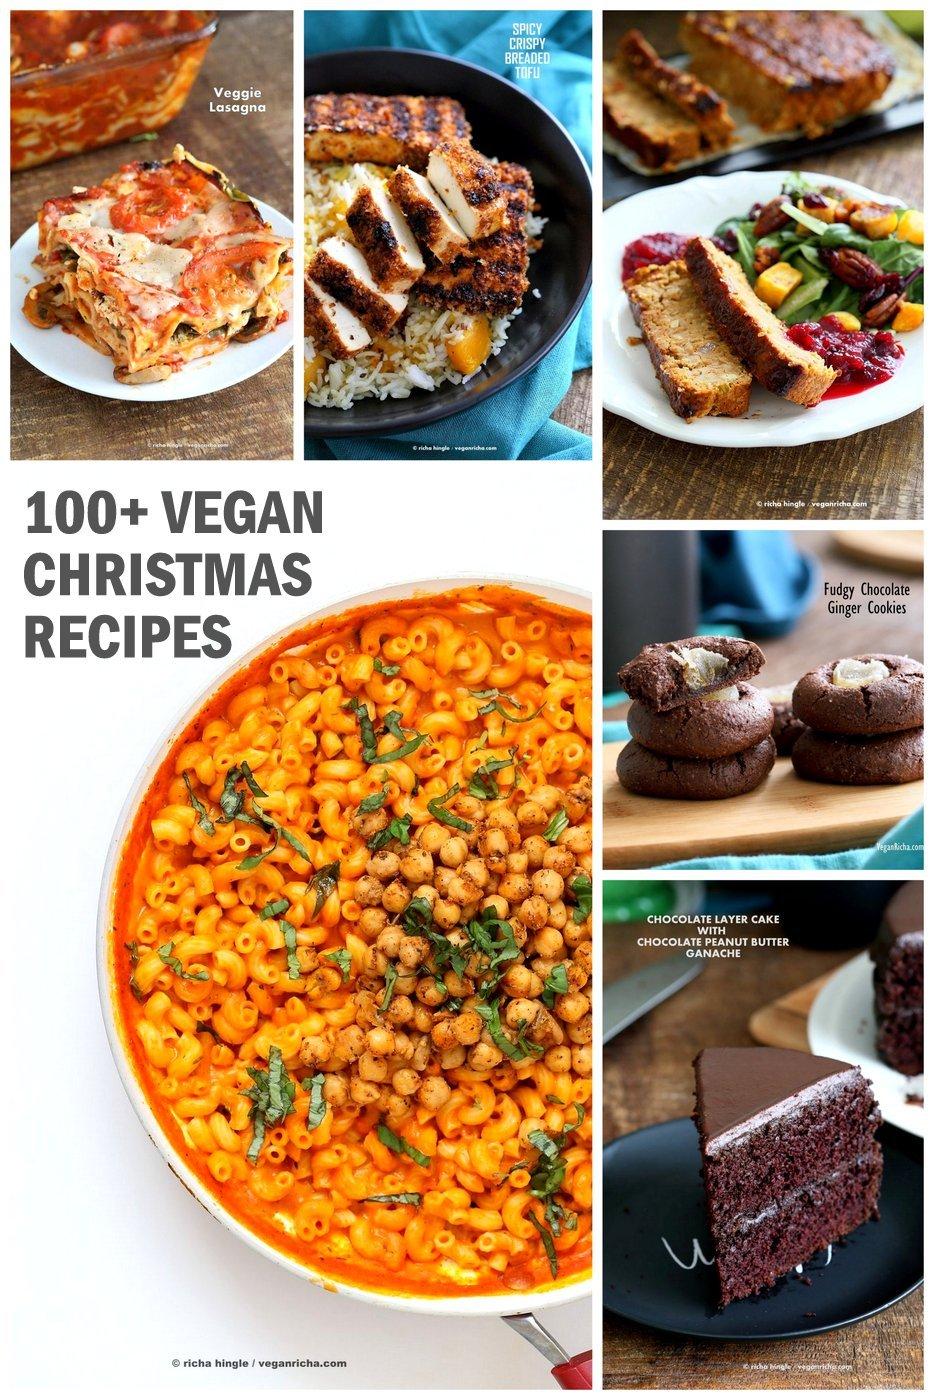 100 Vegan Christmas Recipes Glutenfree options - Vegan Richa